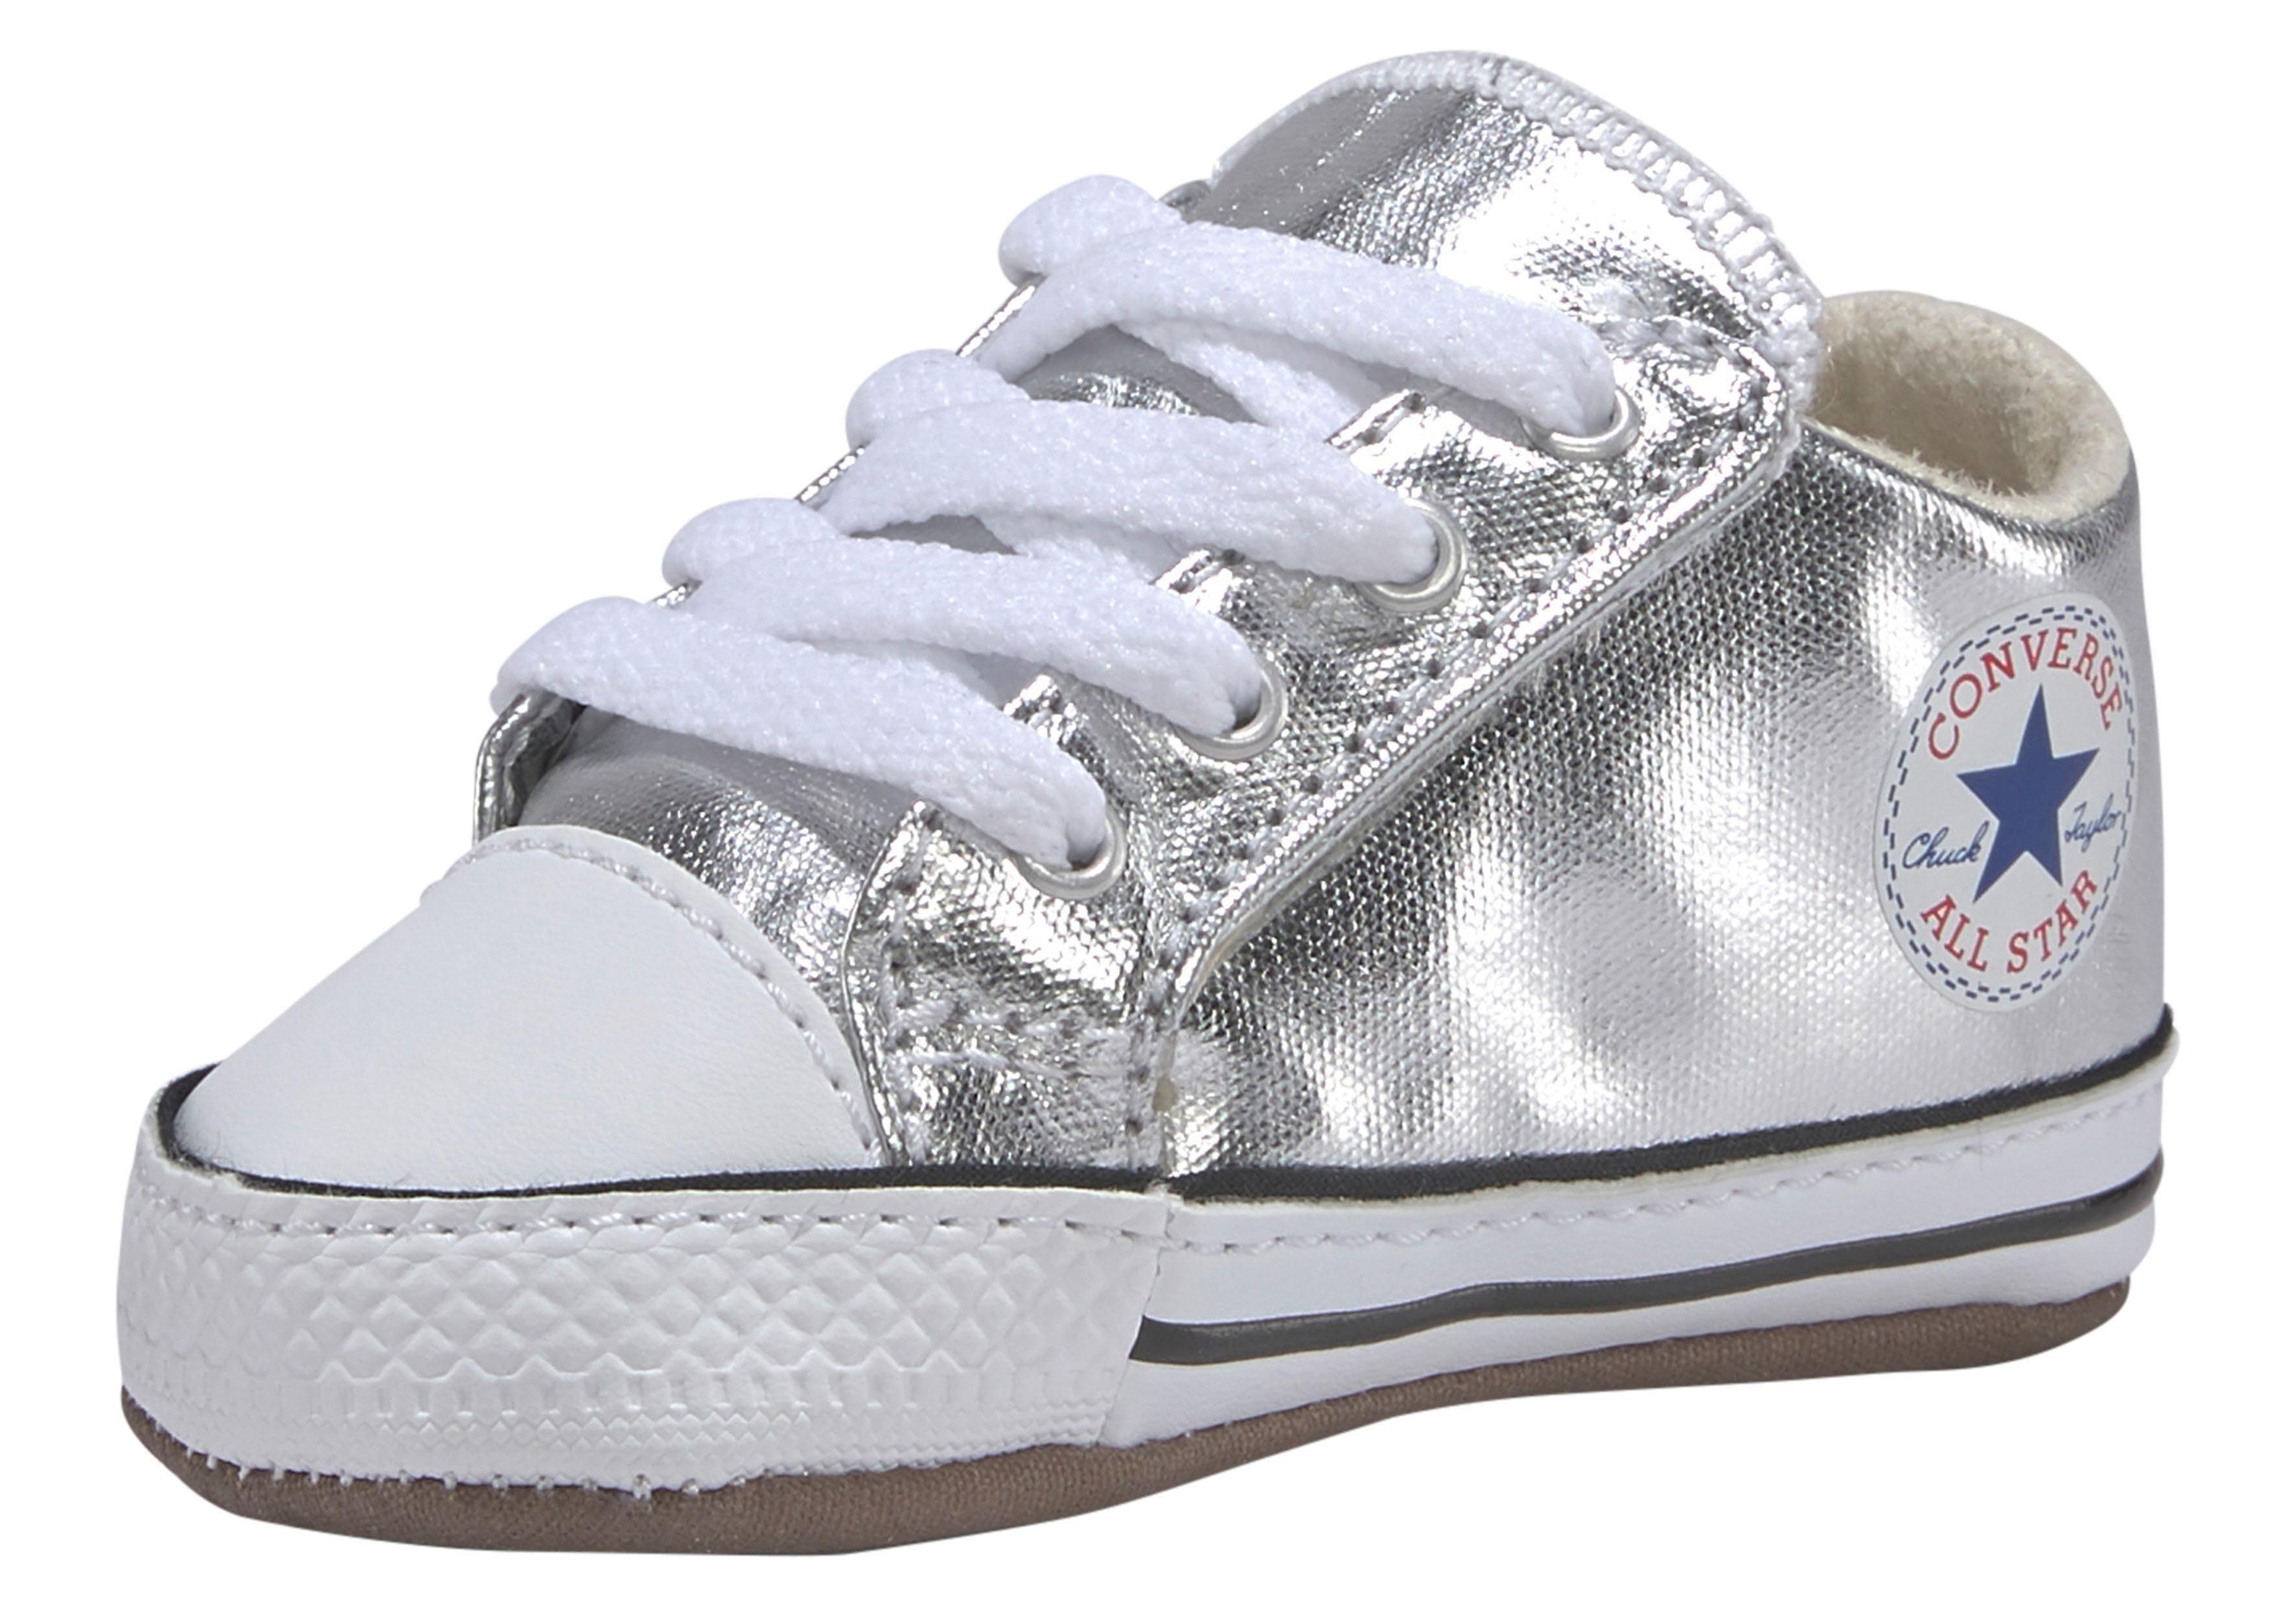 Converse »CHUCK TAYLOR ALL STAR CRIBSTER METALLIC CANVAS MID« Sneaker online kaufen   OTTO